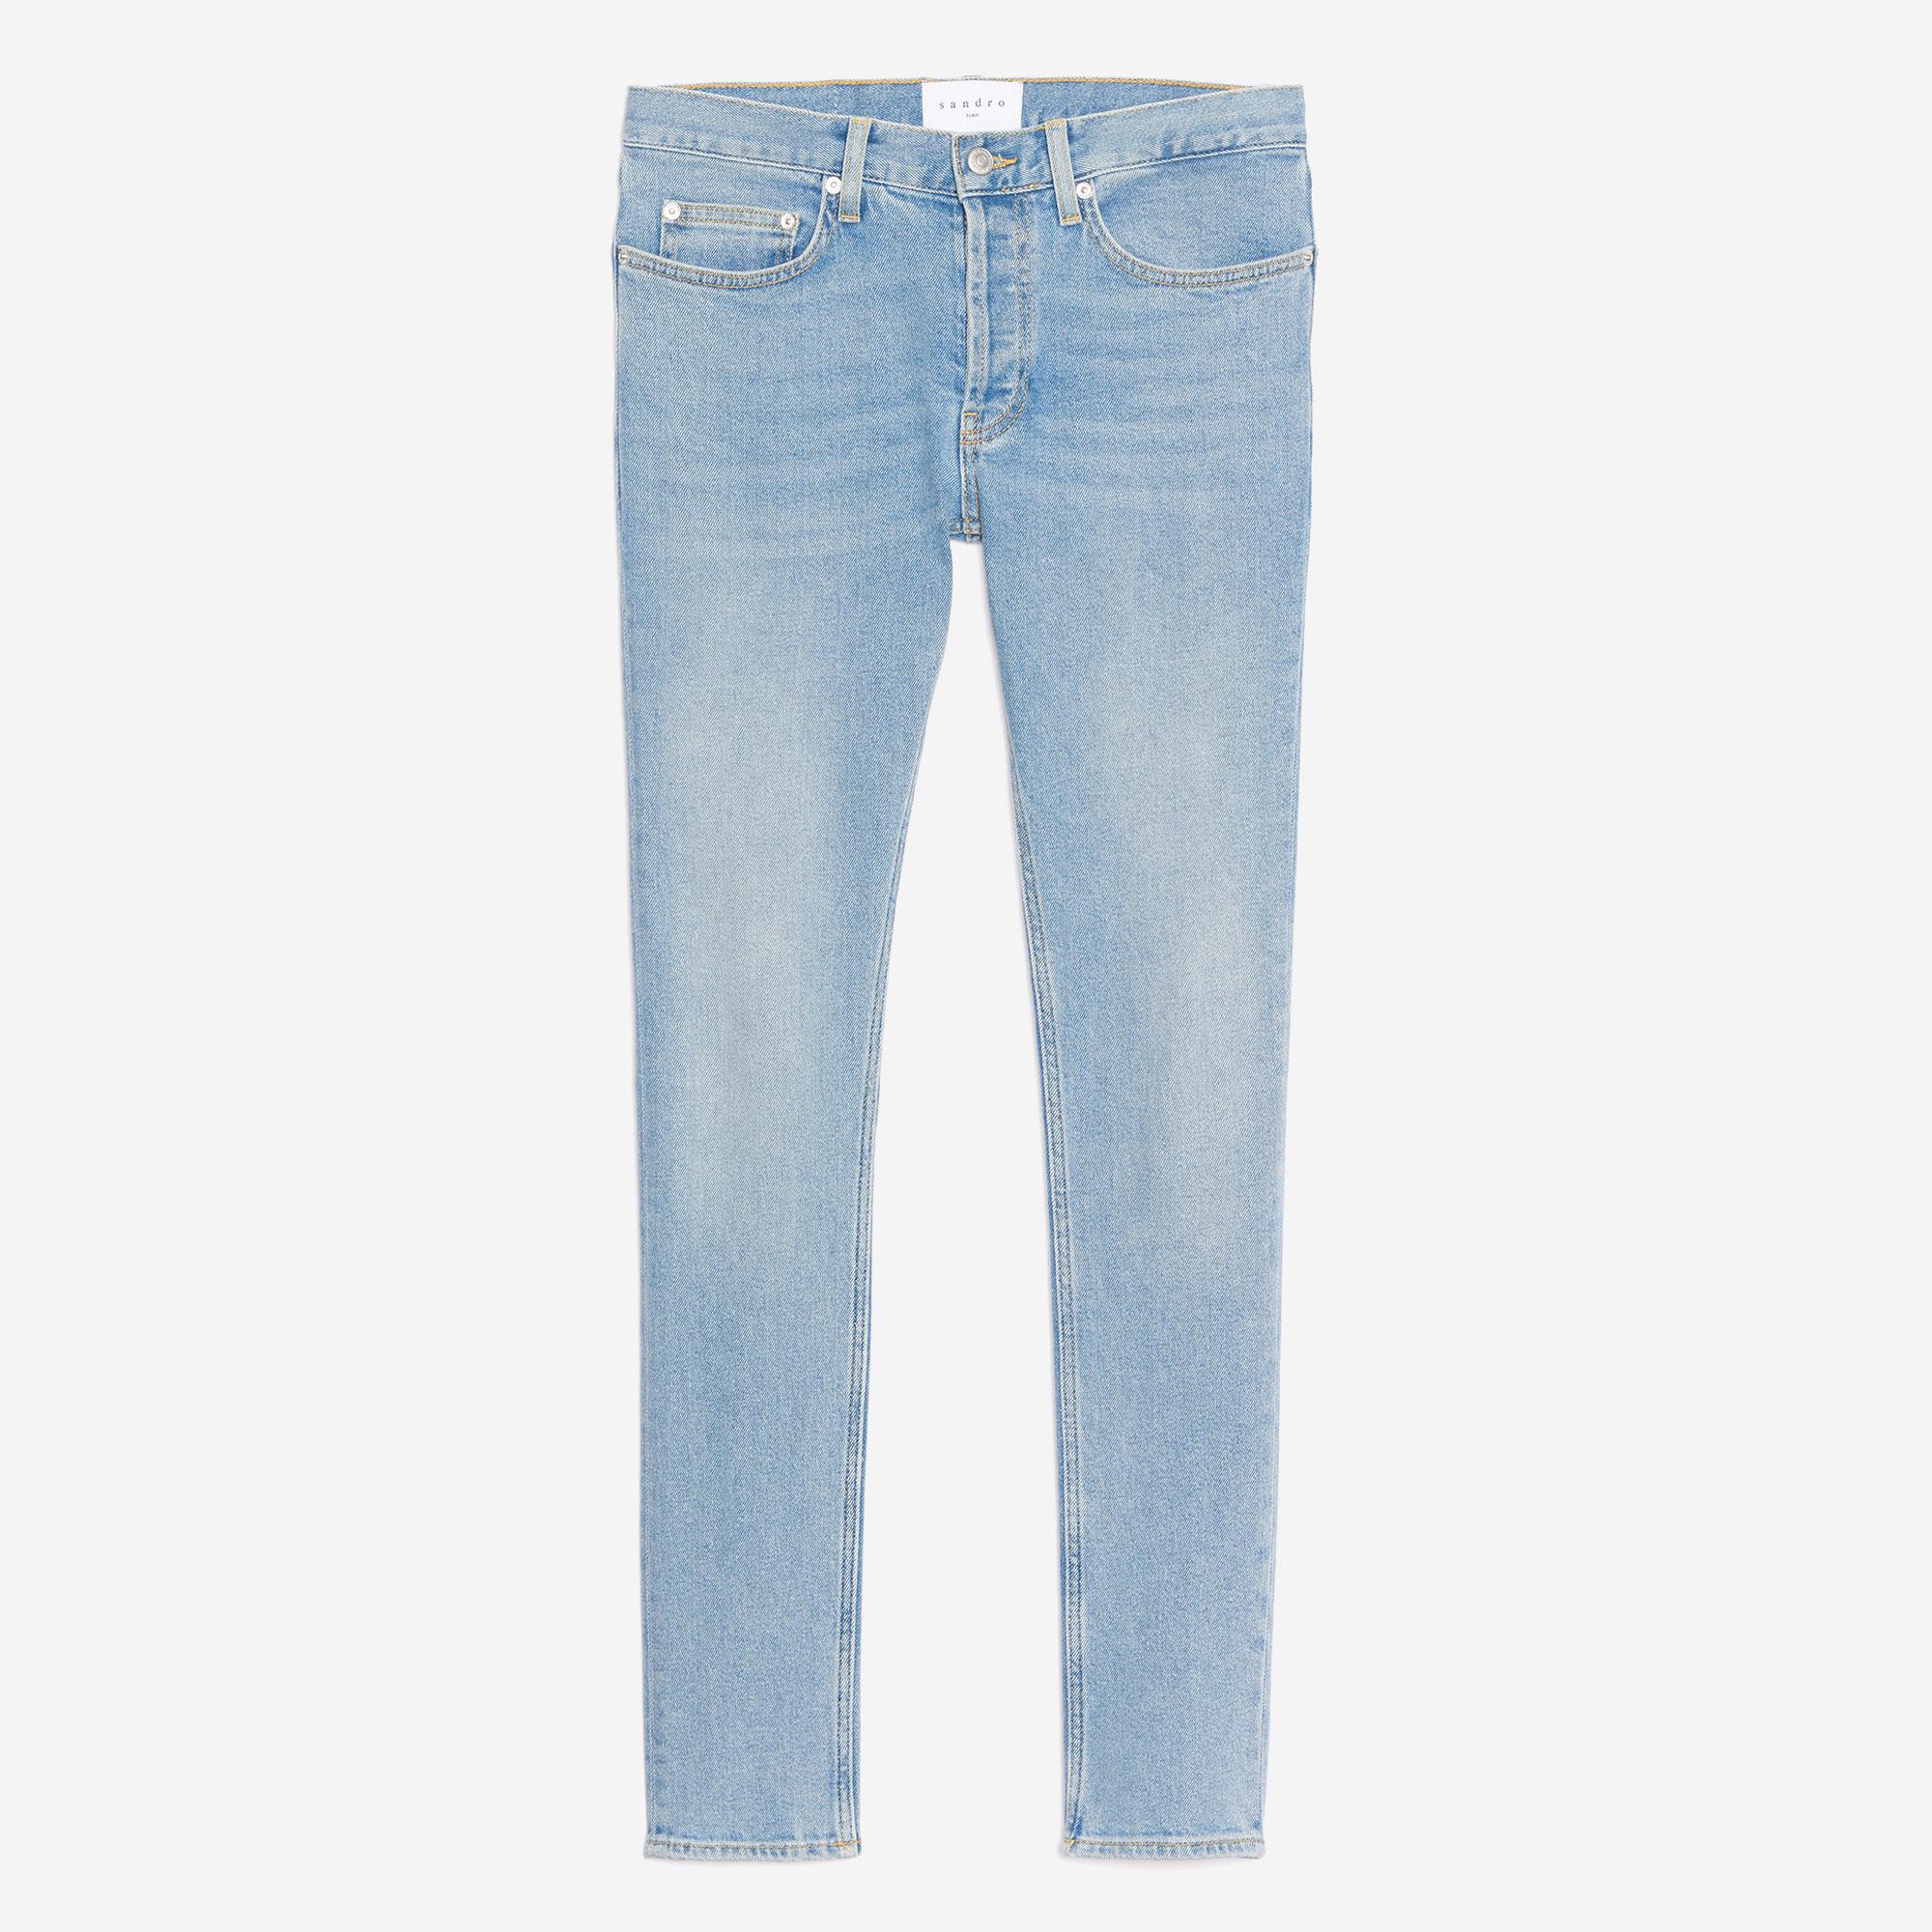 Jeans chiaro délavé - Skinny : Jeans colore Blu Chiaro